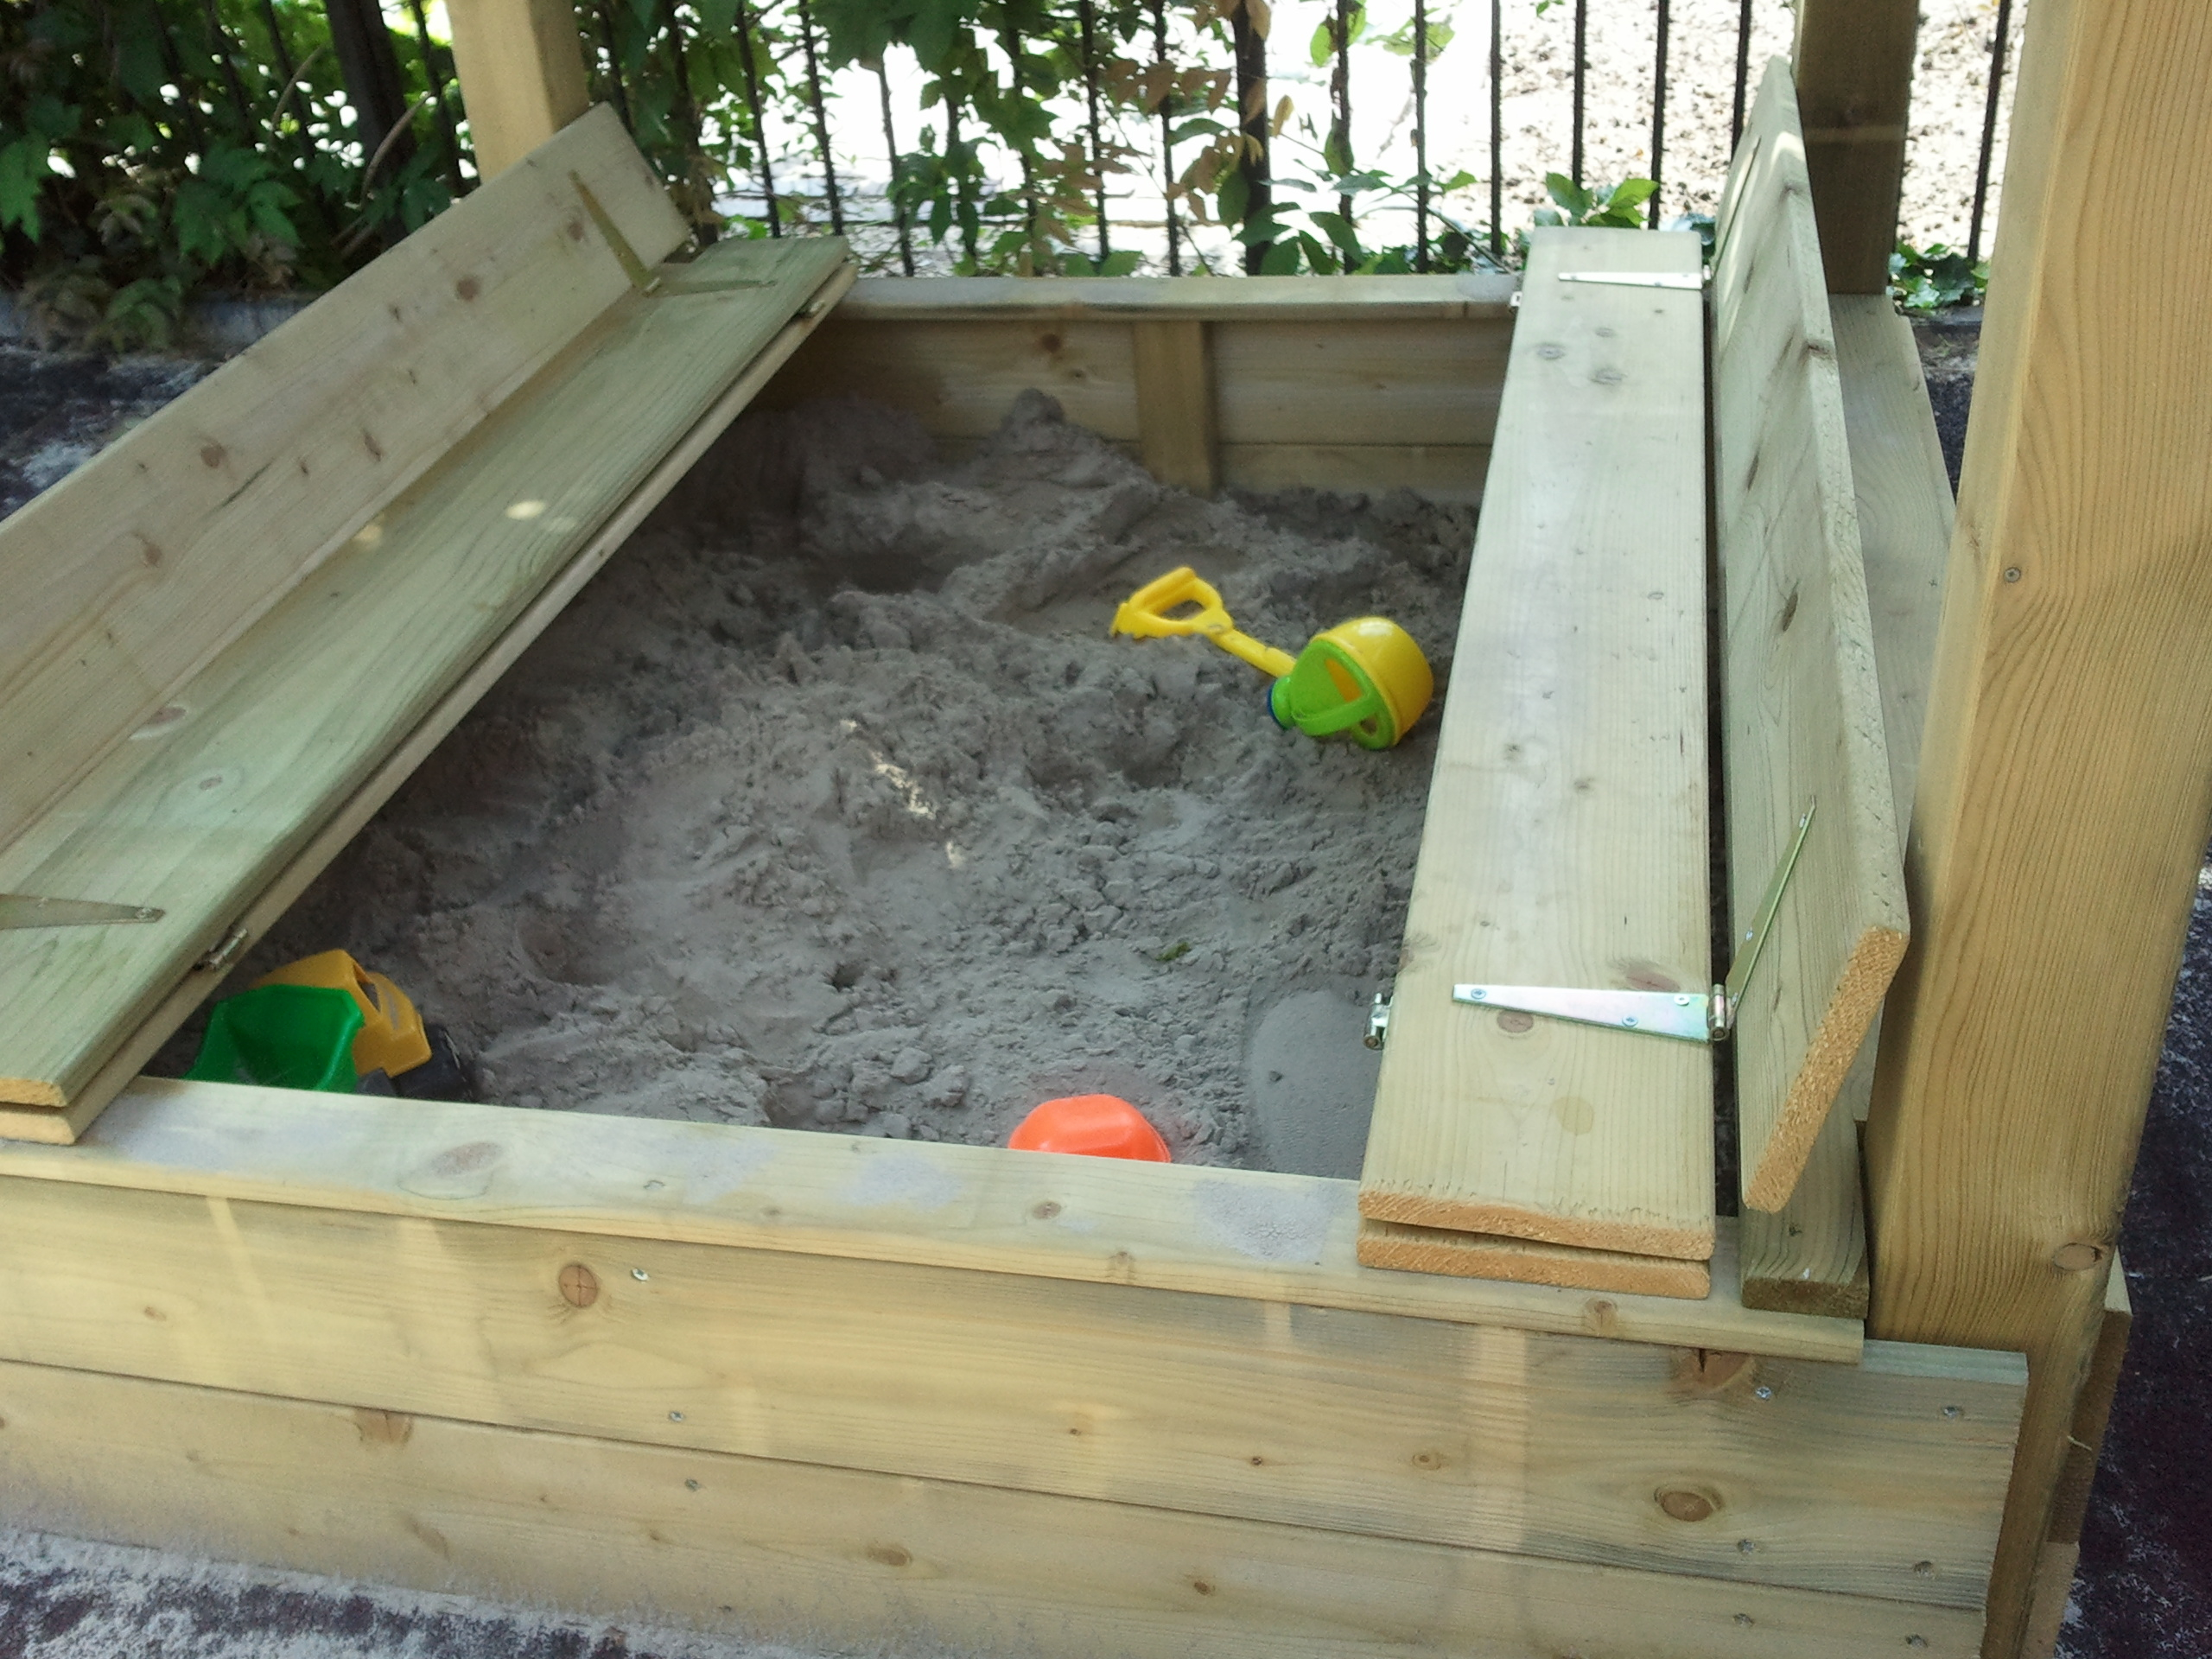 Speeltoren zandbak met opklap bankje